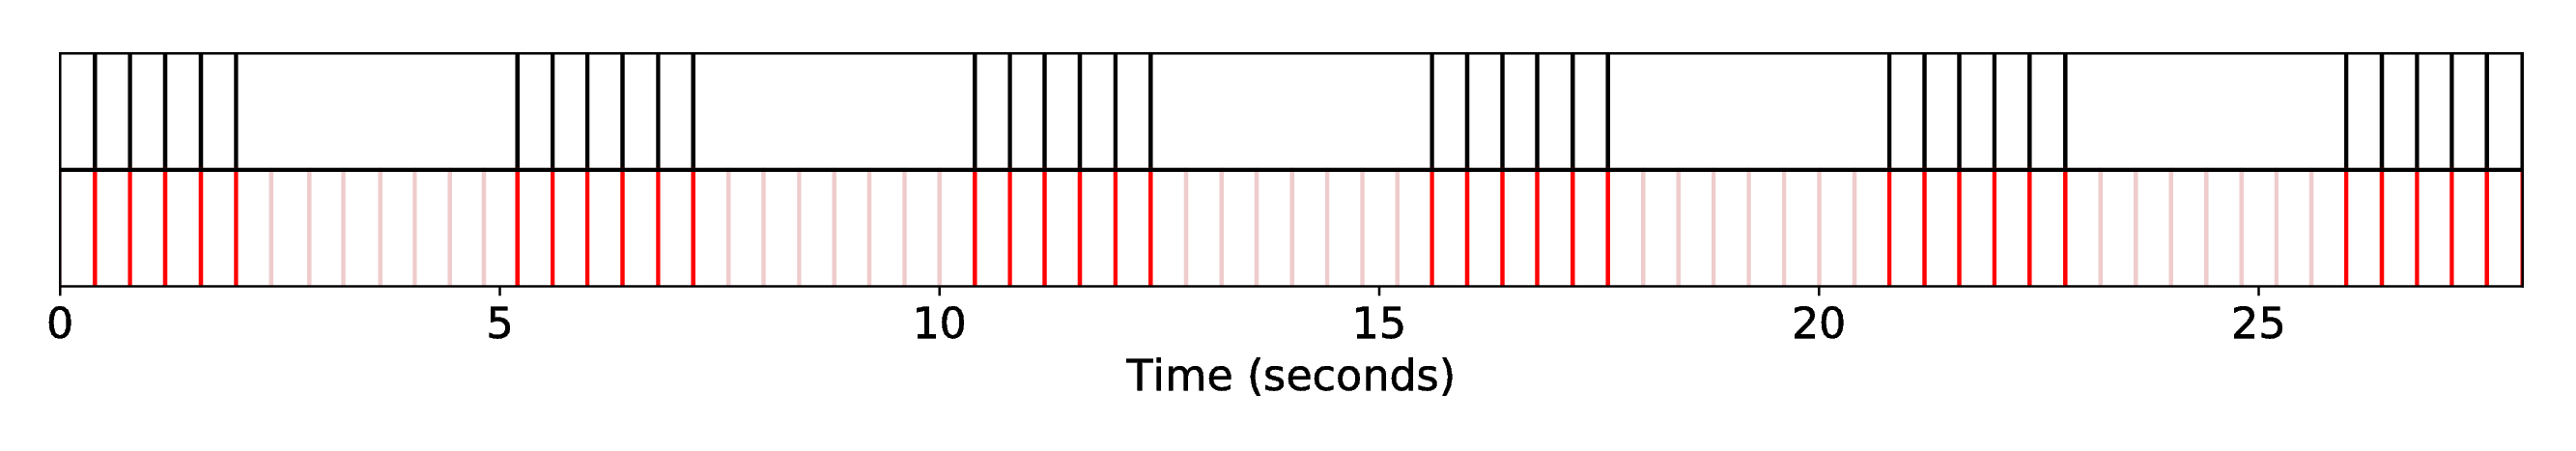 DP1_INT1_R-Syn-CoGa__S-Fandango__SequenceAlignment